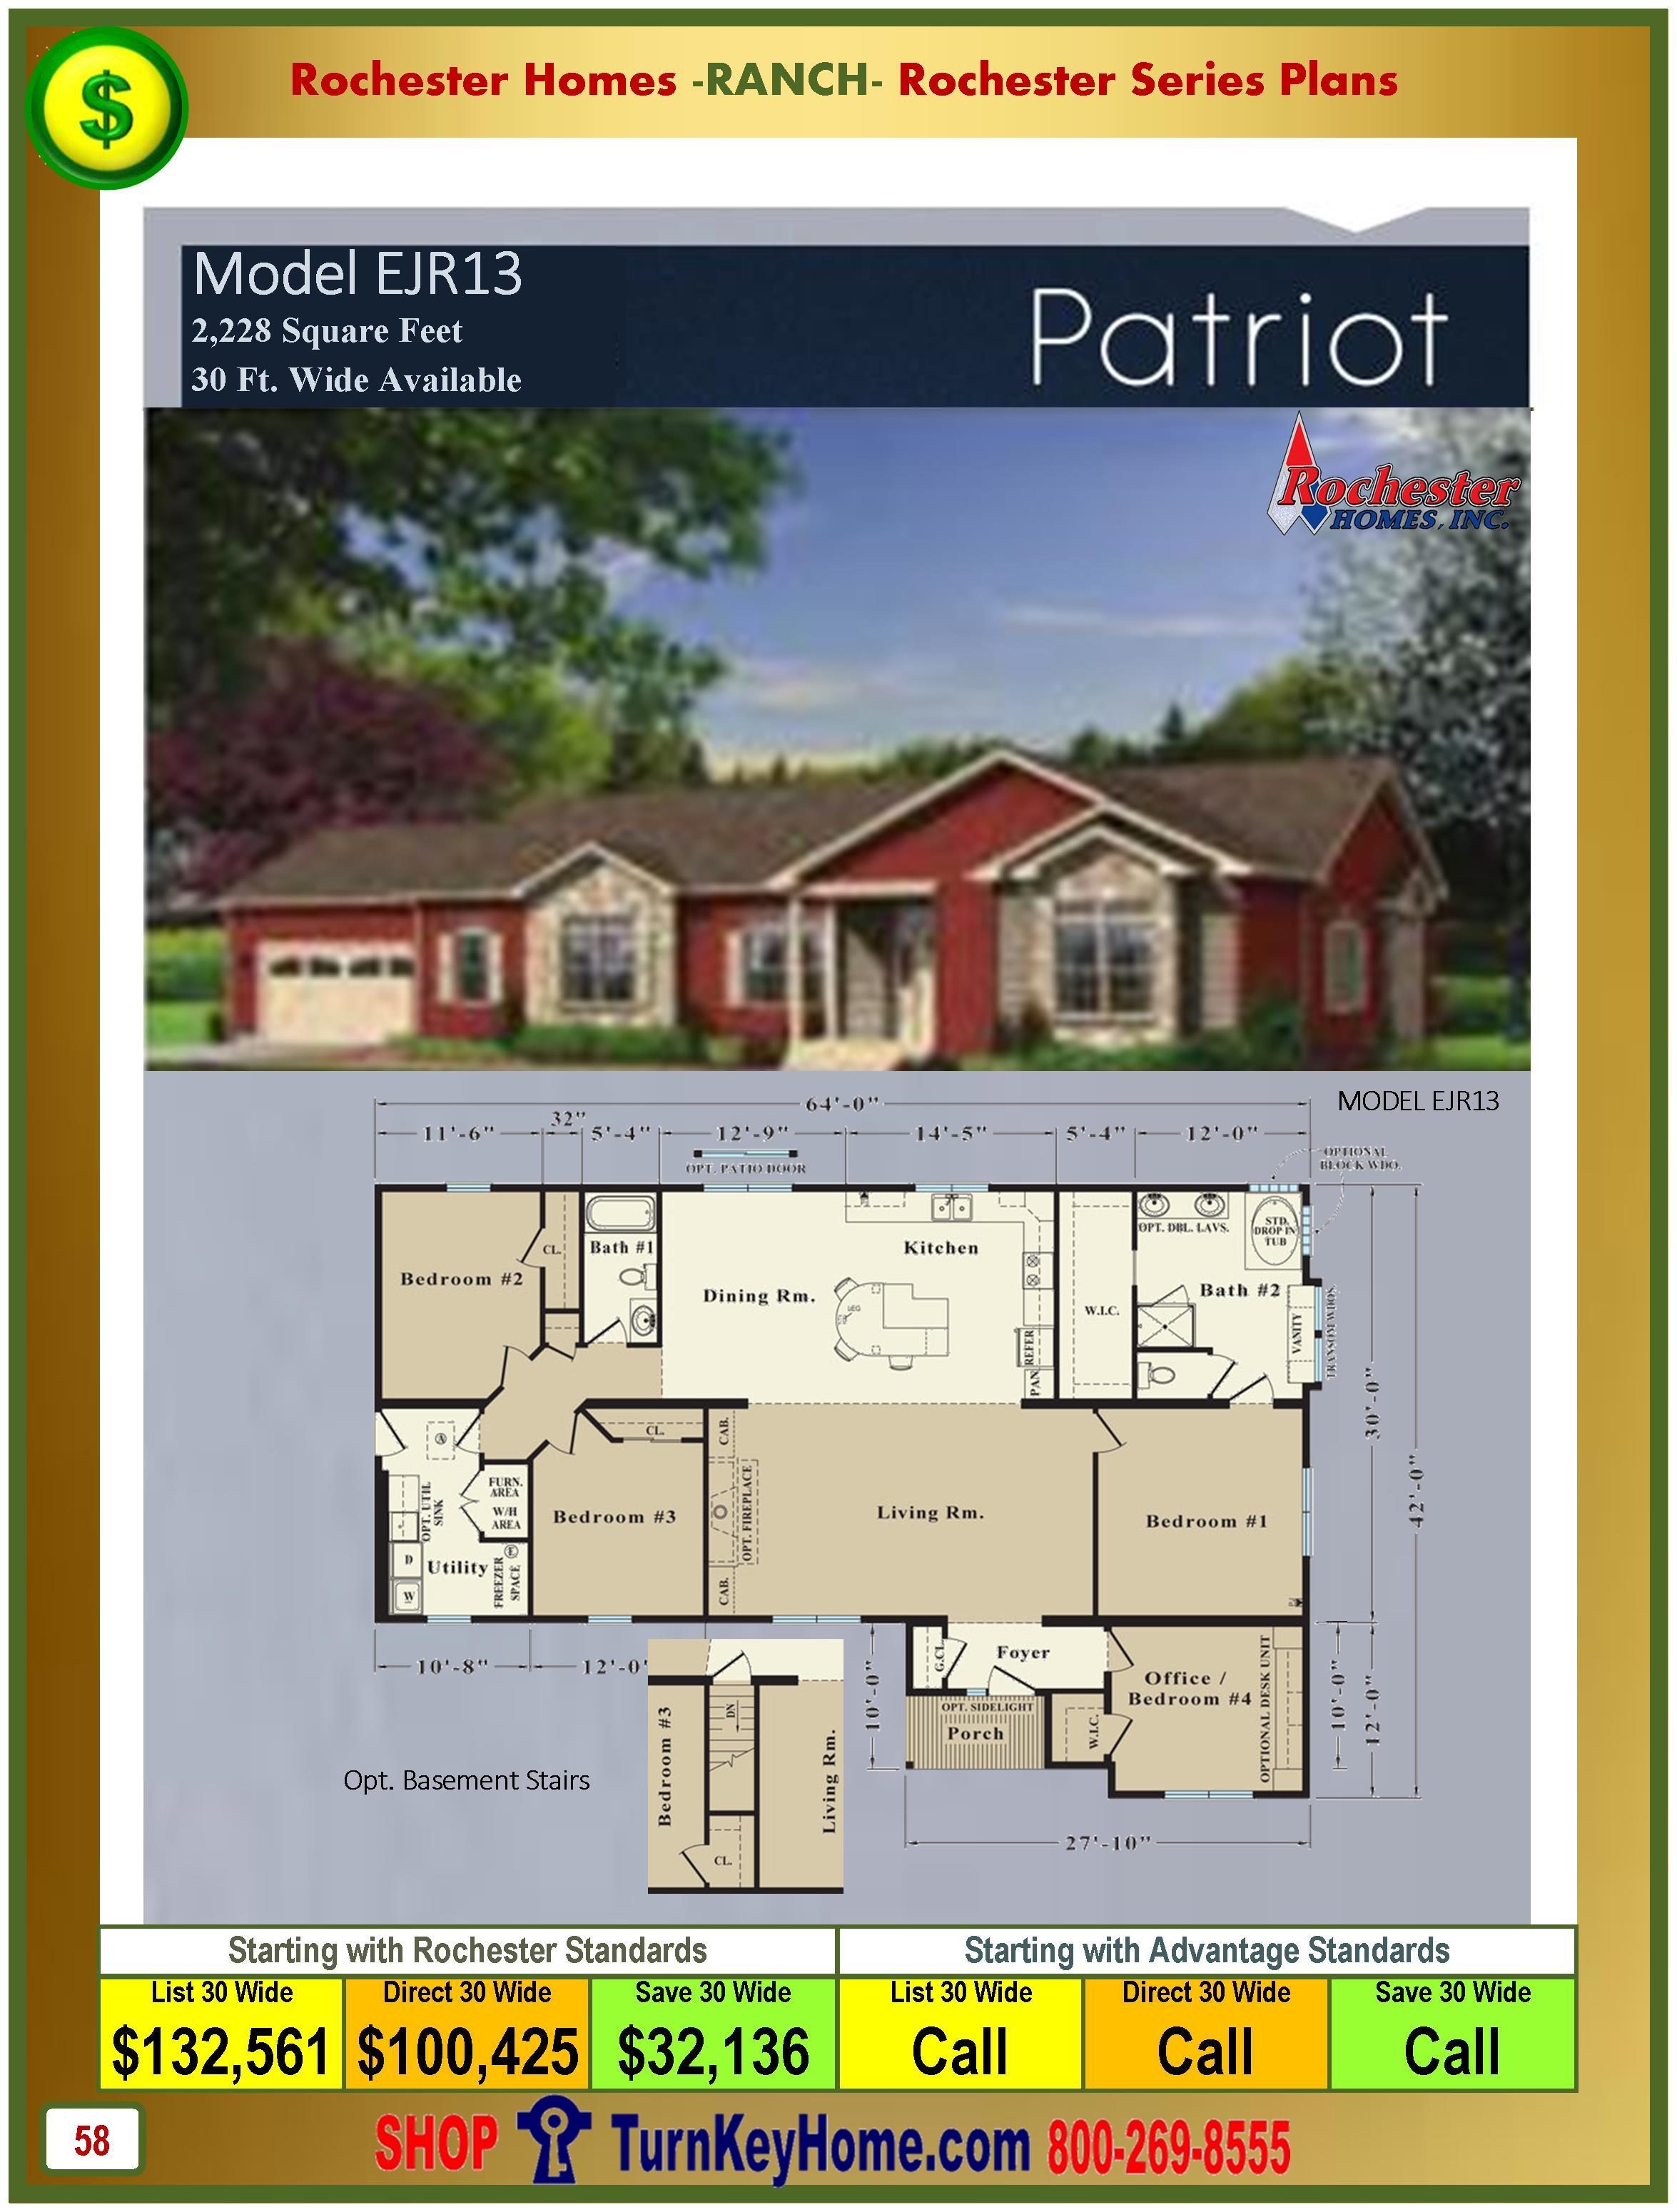 Modular.Homes.Rochester.Home.Inc.Patriot.EJR13.Ranch.Plan.Price.Catalog.P58.1215